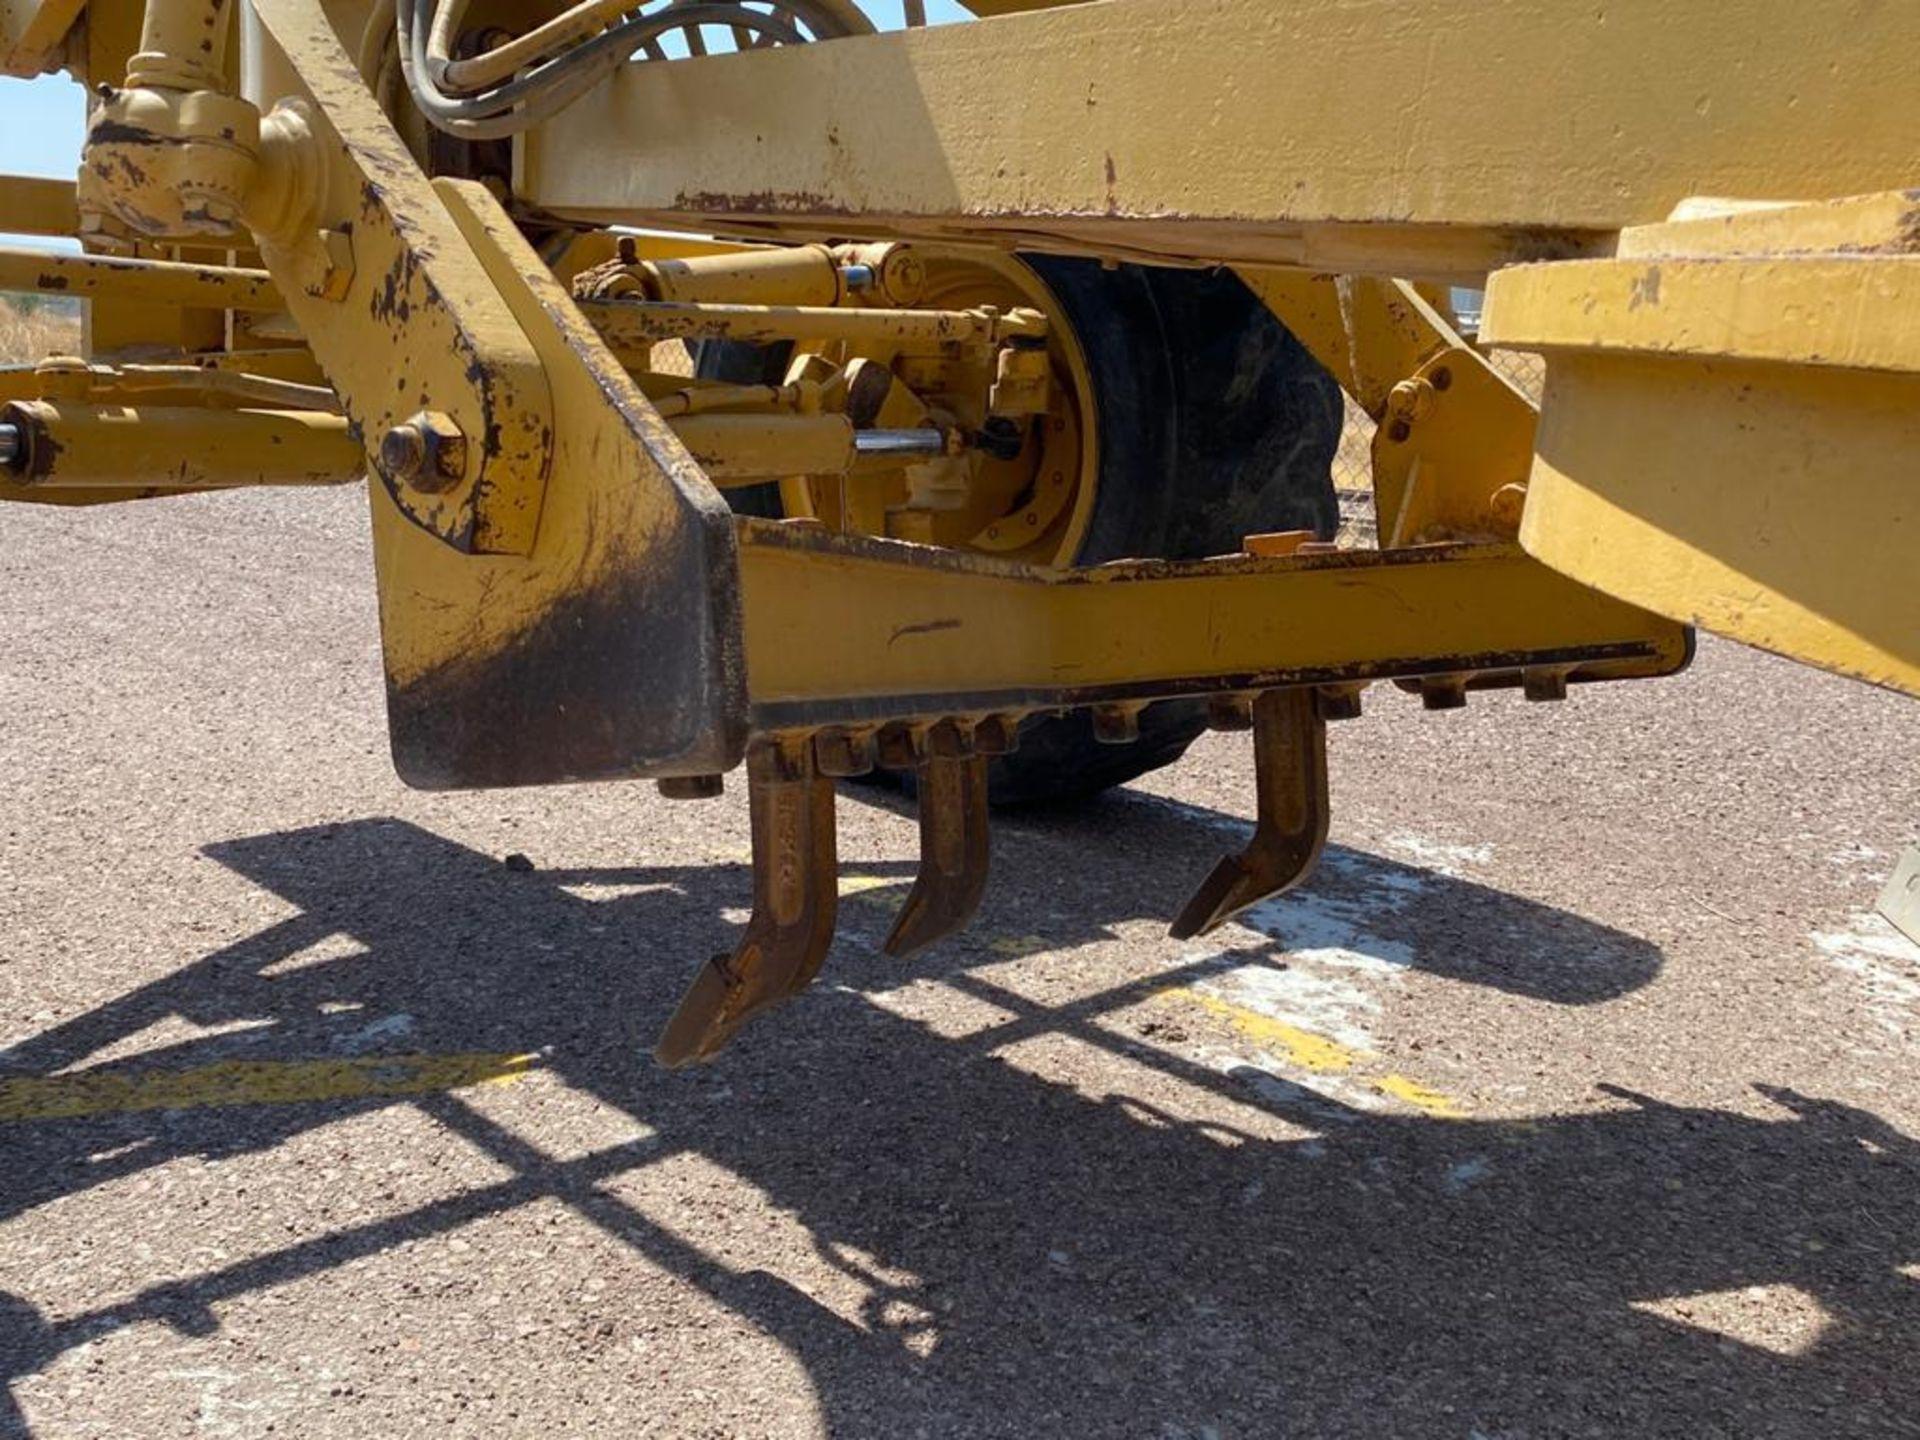 Caterpillar 120G Motor Grader, Serial number 87V09646, Motor number PQ883-2/07Z28983 - Image 27 of 61